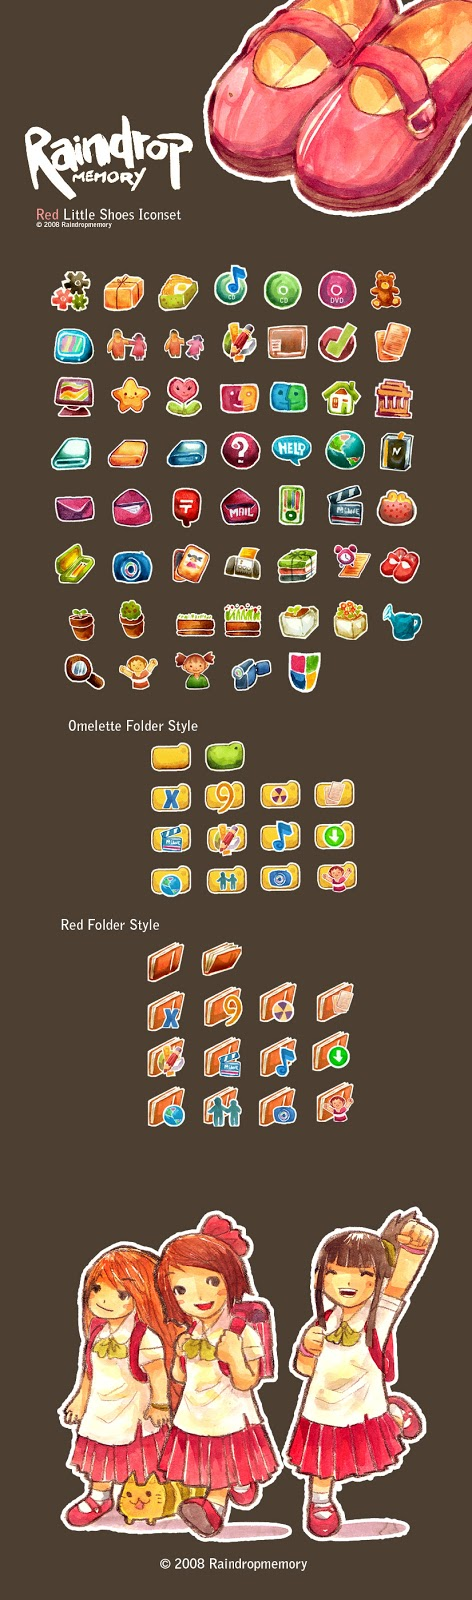 I love Kawaii: Rilakkuma Desktop Wallpaper With Cute Icons